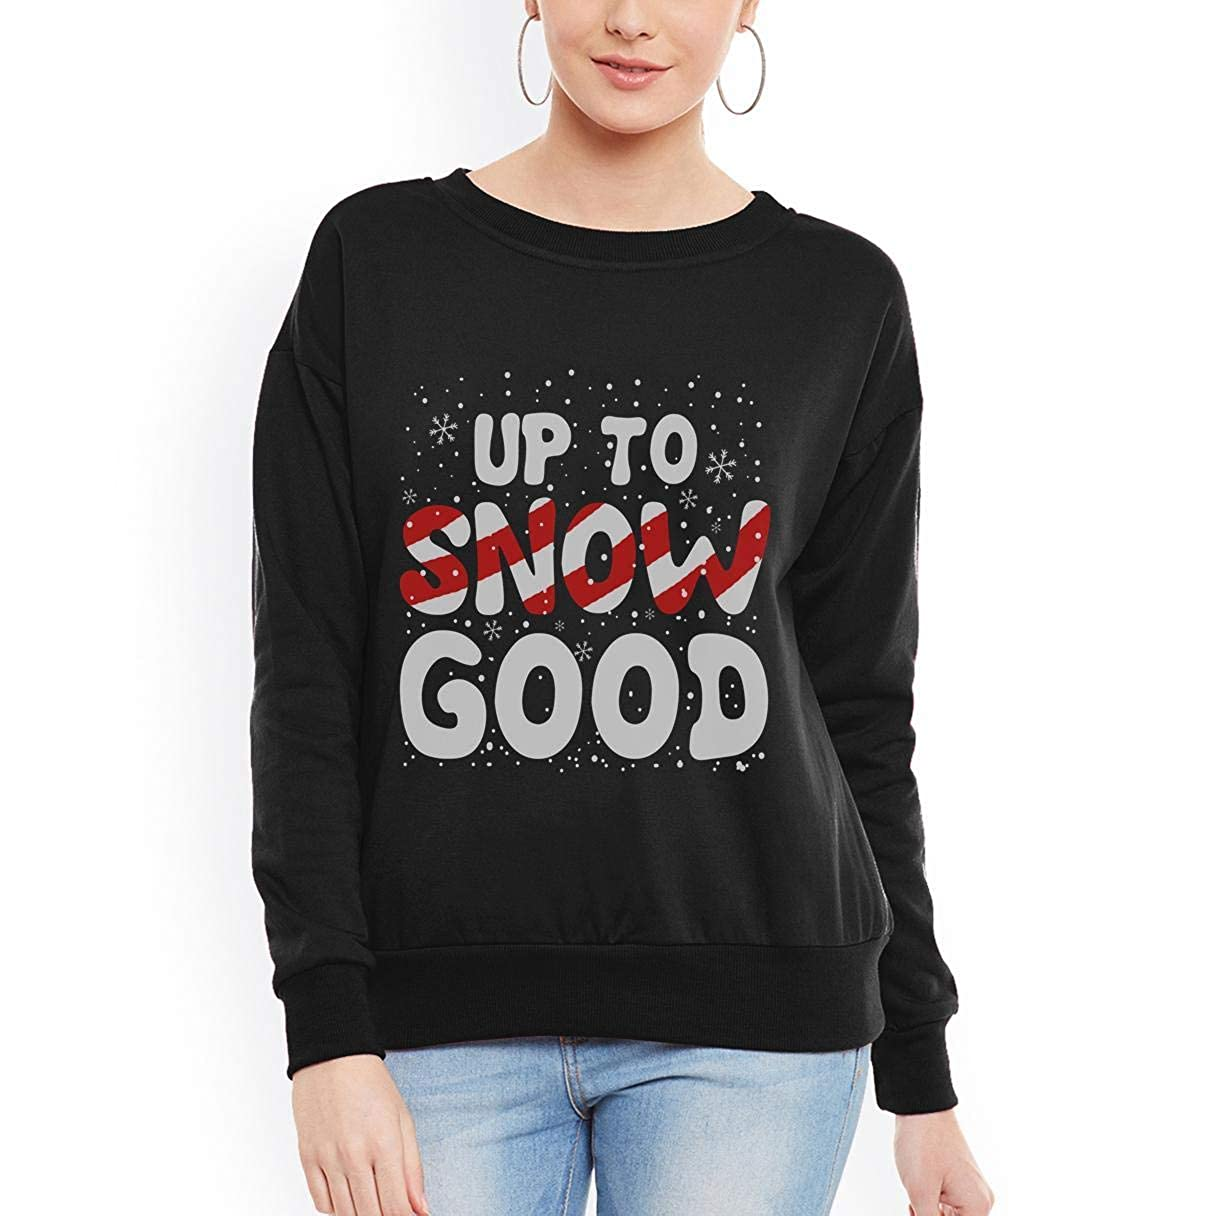 tee Up to Snow Good Funny Snowflakes Christmas Women Sweatshirt